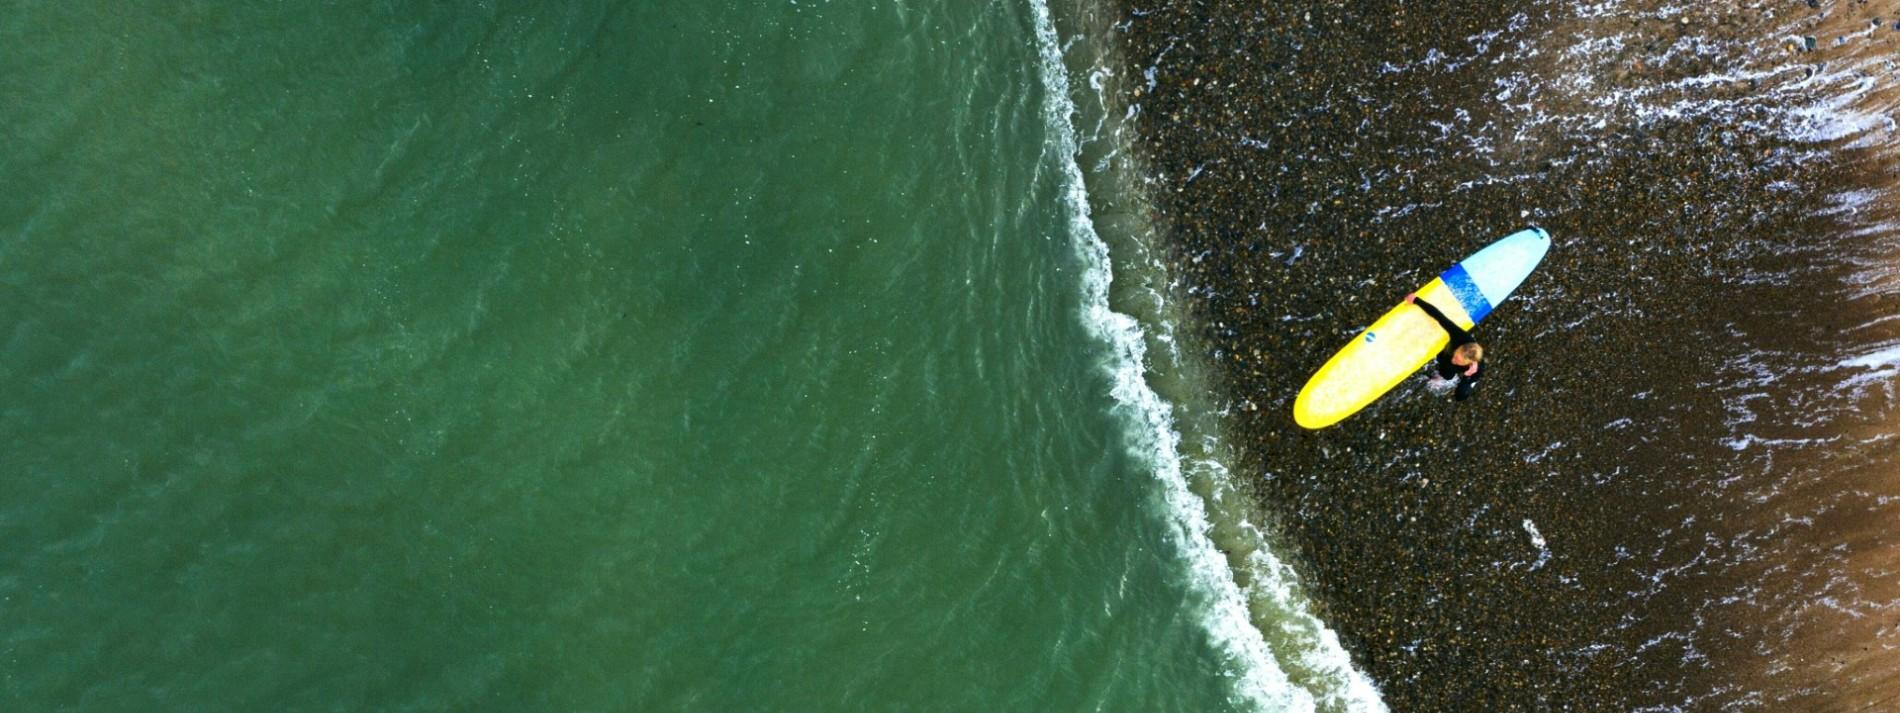 Corona-Welle lockt Surfer nach Dänemark